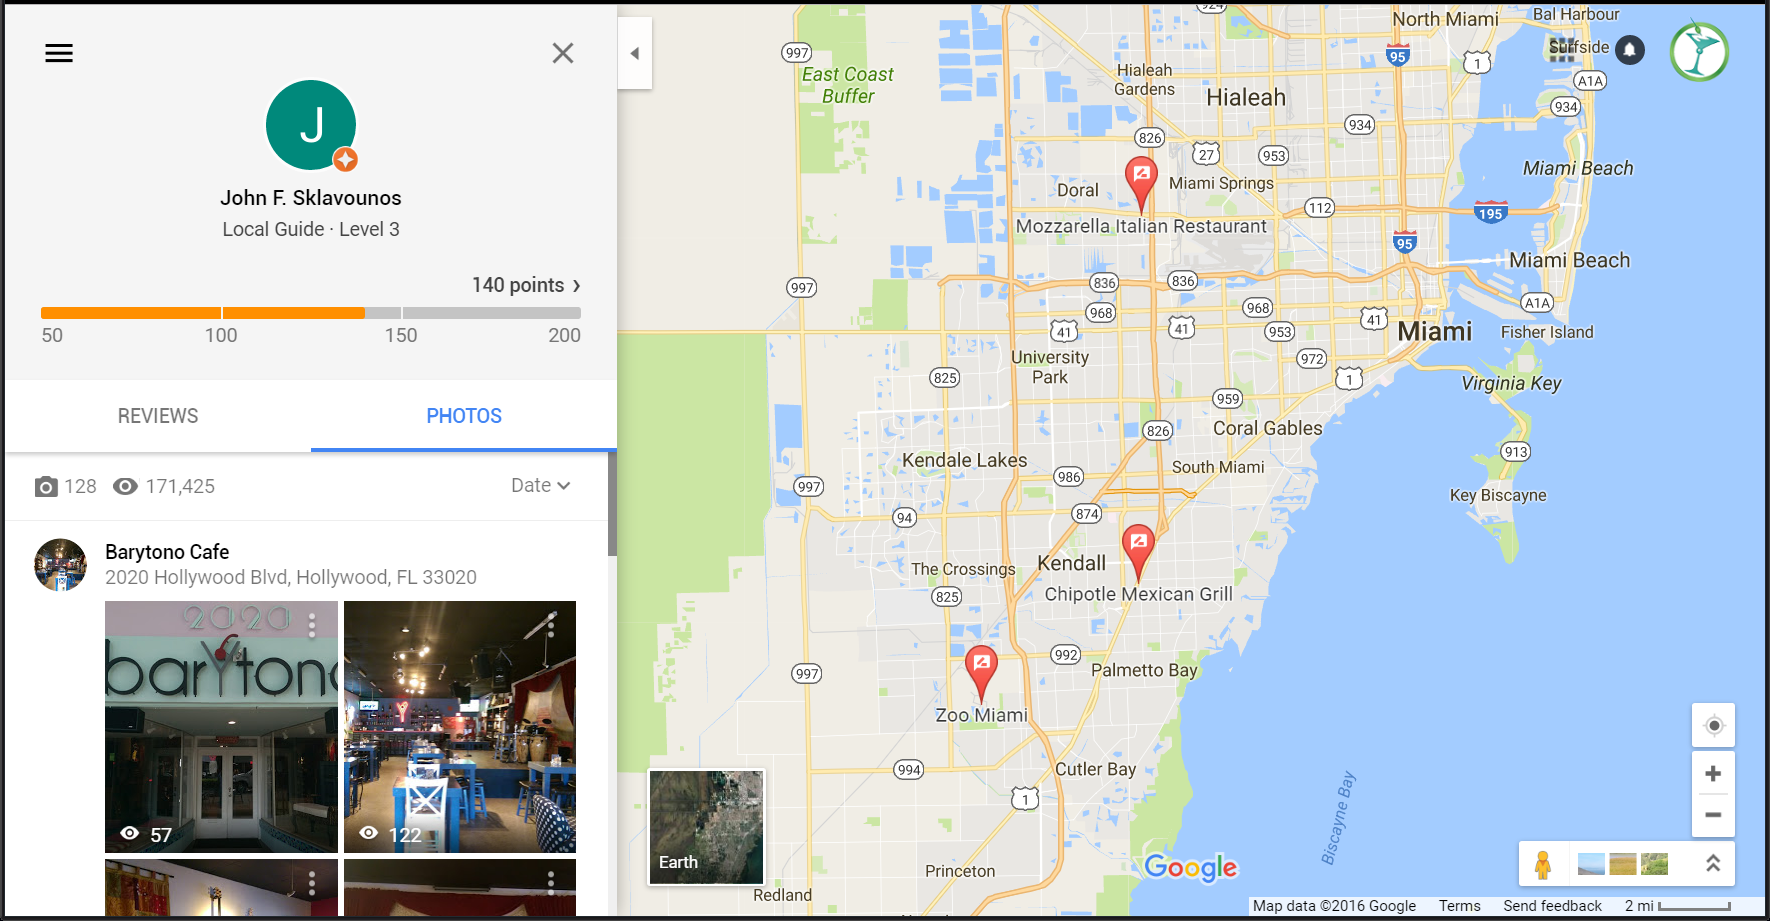 Social Media Google Maps views as of 2016-10-11